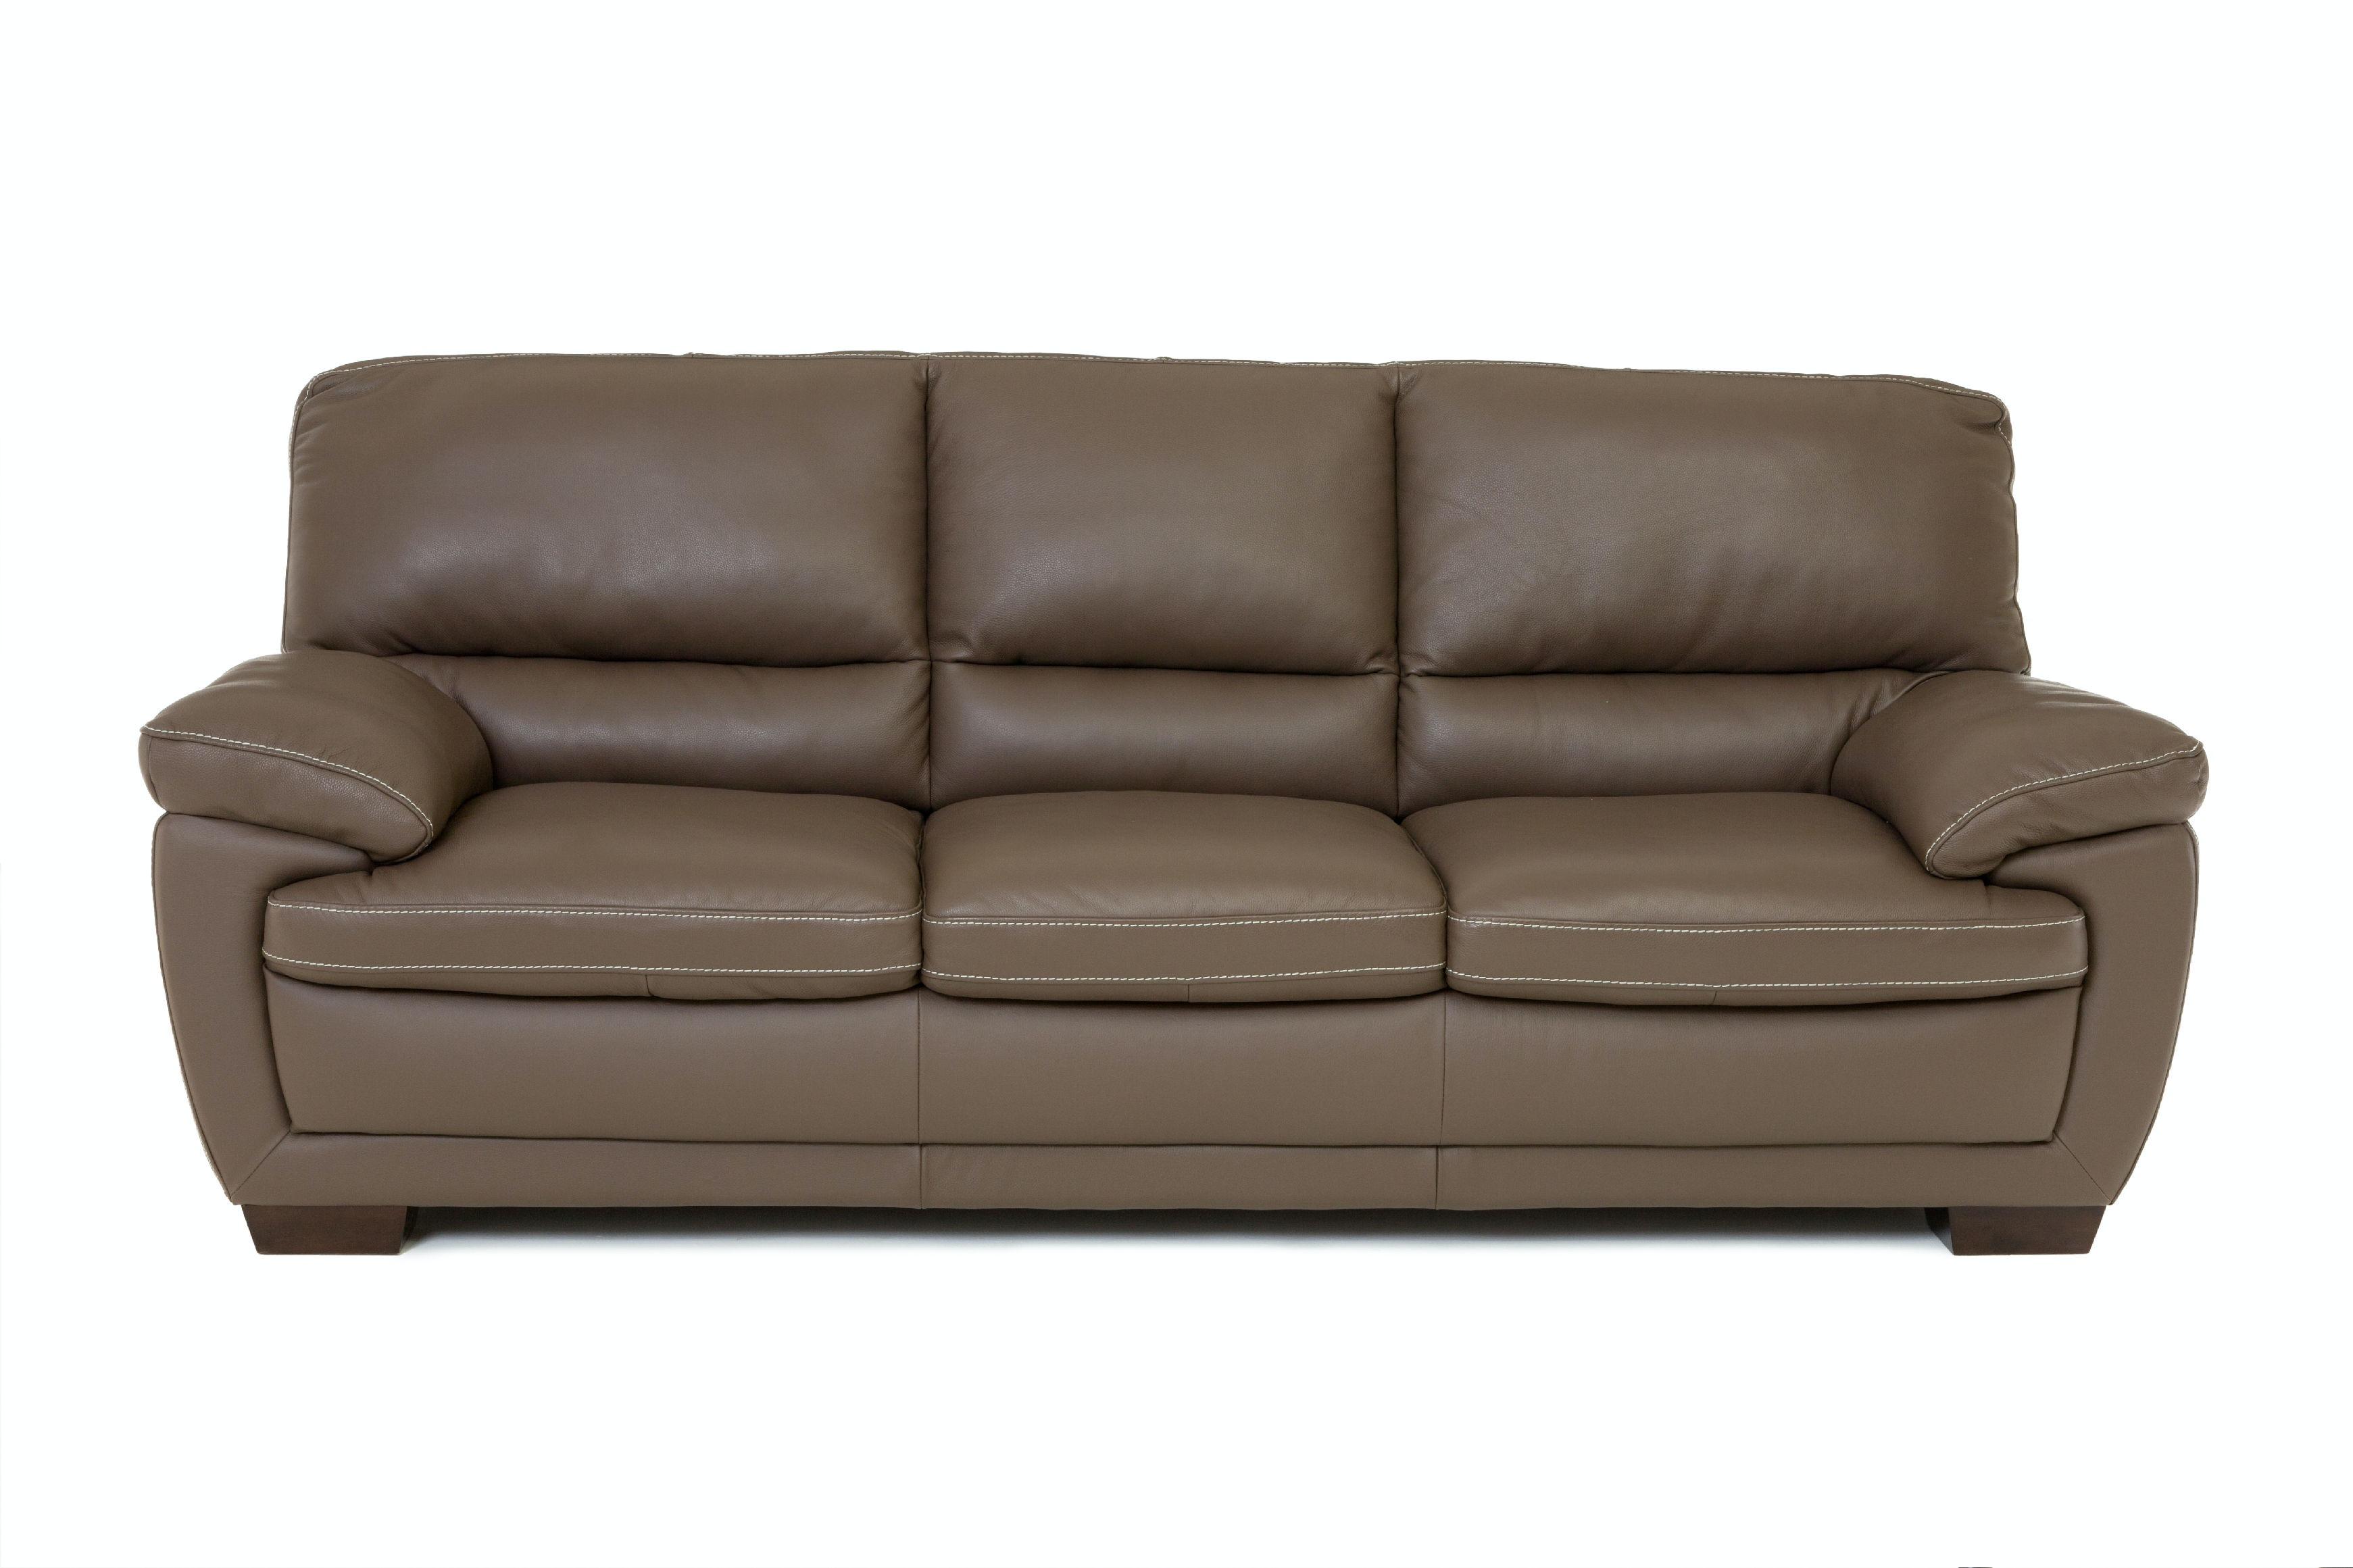 Denver Leather Sofa Dark Taupe